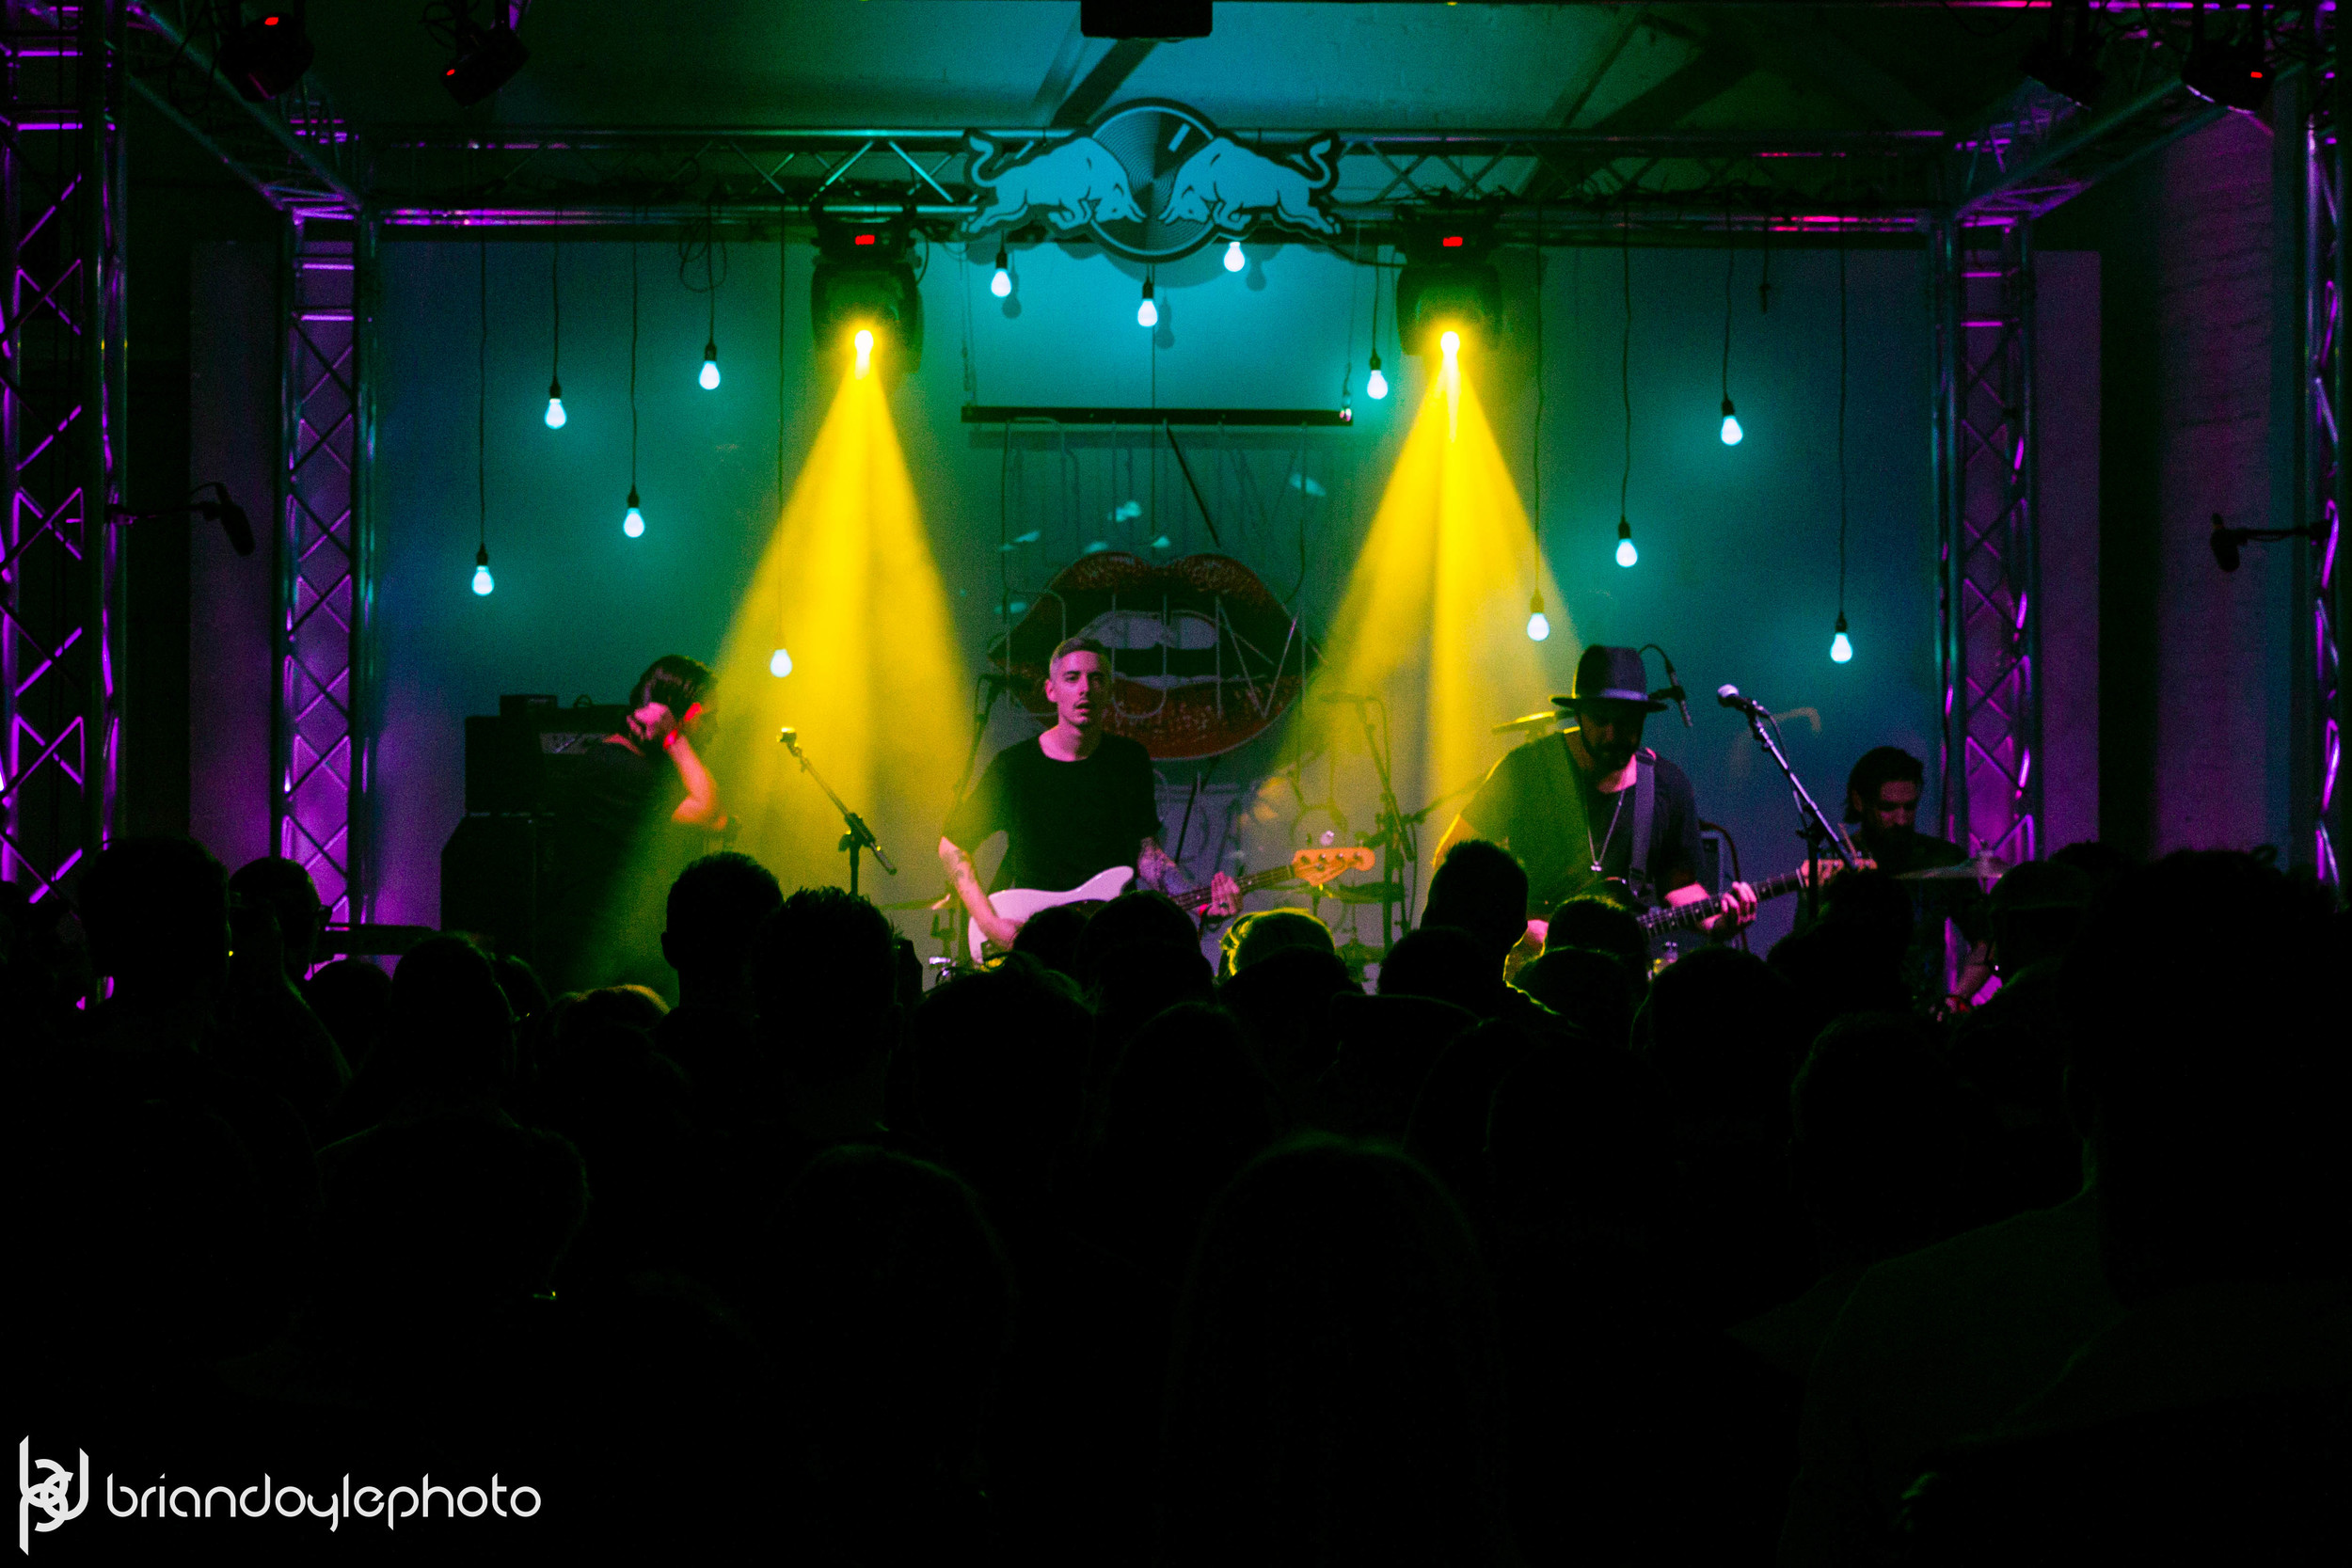 Red Bull - Dum Dum Girls, Tropicana and the Flea, Lowell @ The Well 2014.11.16-21.jpg